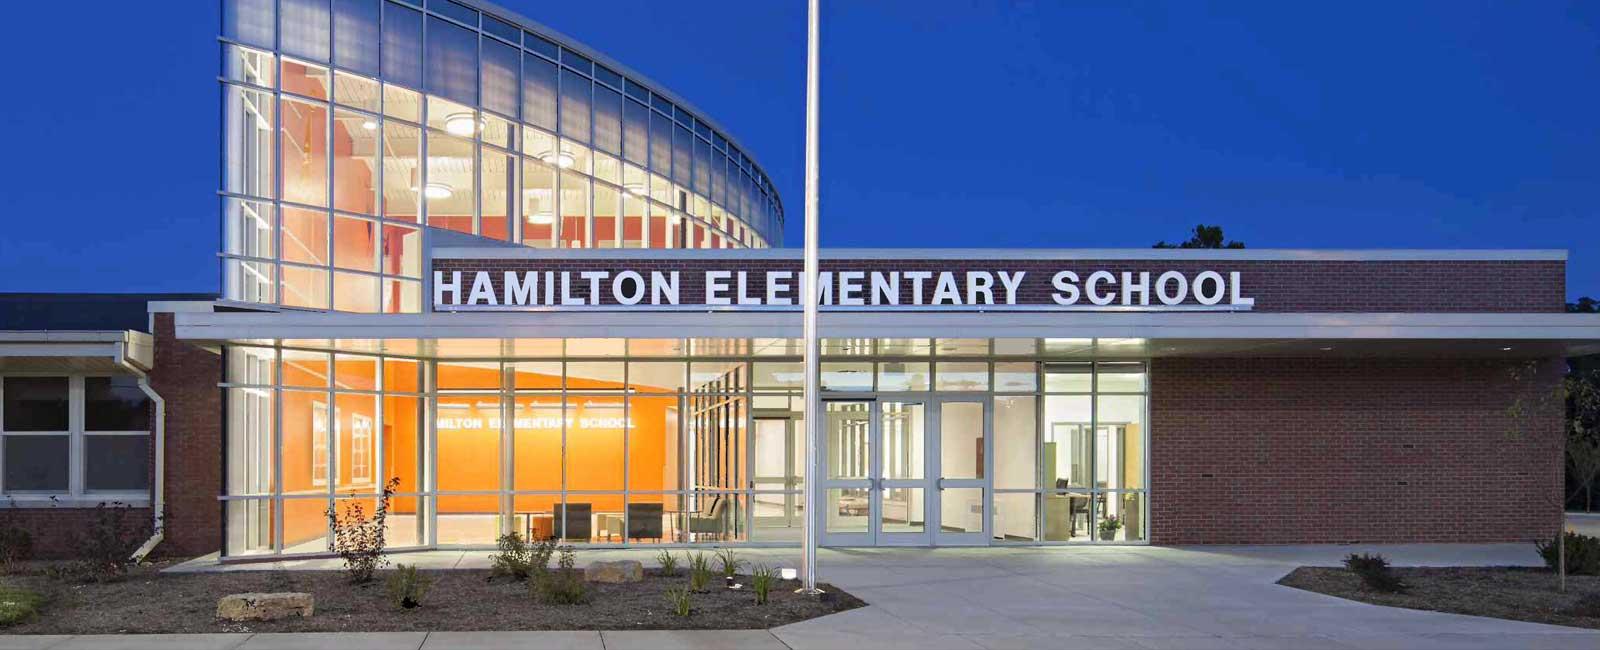 Hamilton Elementary School, Tri-City Electric Co., Davenport